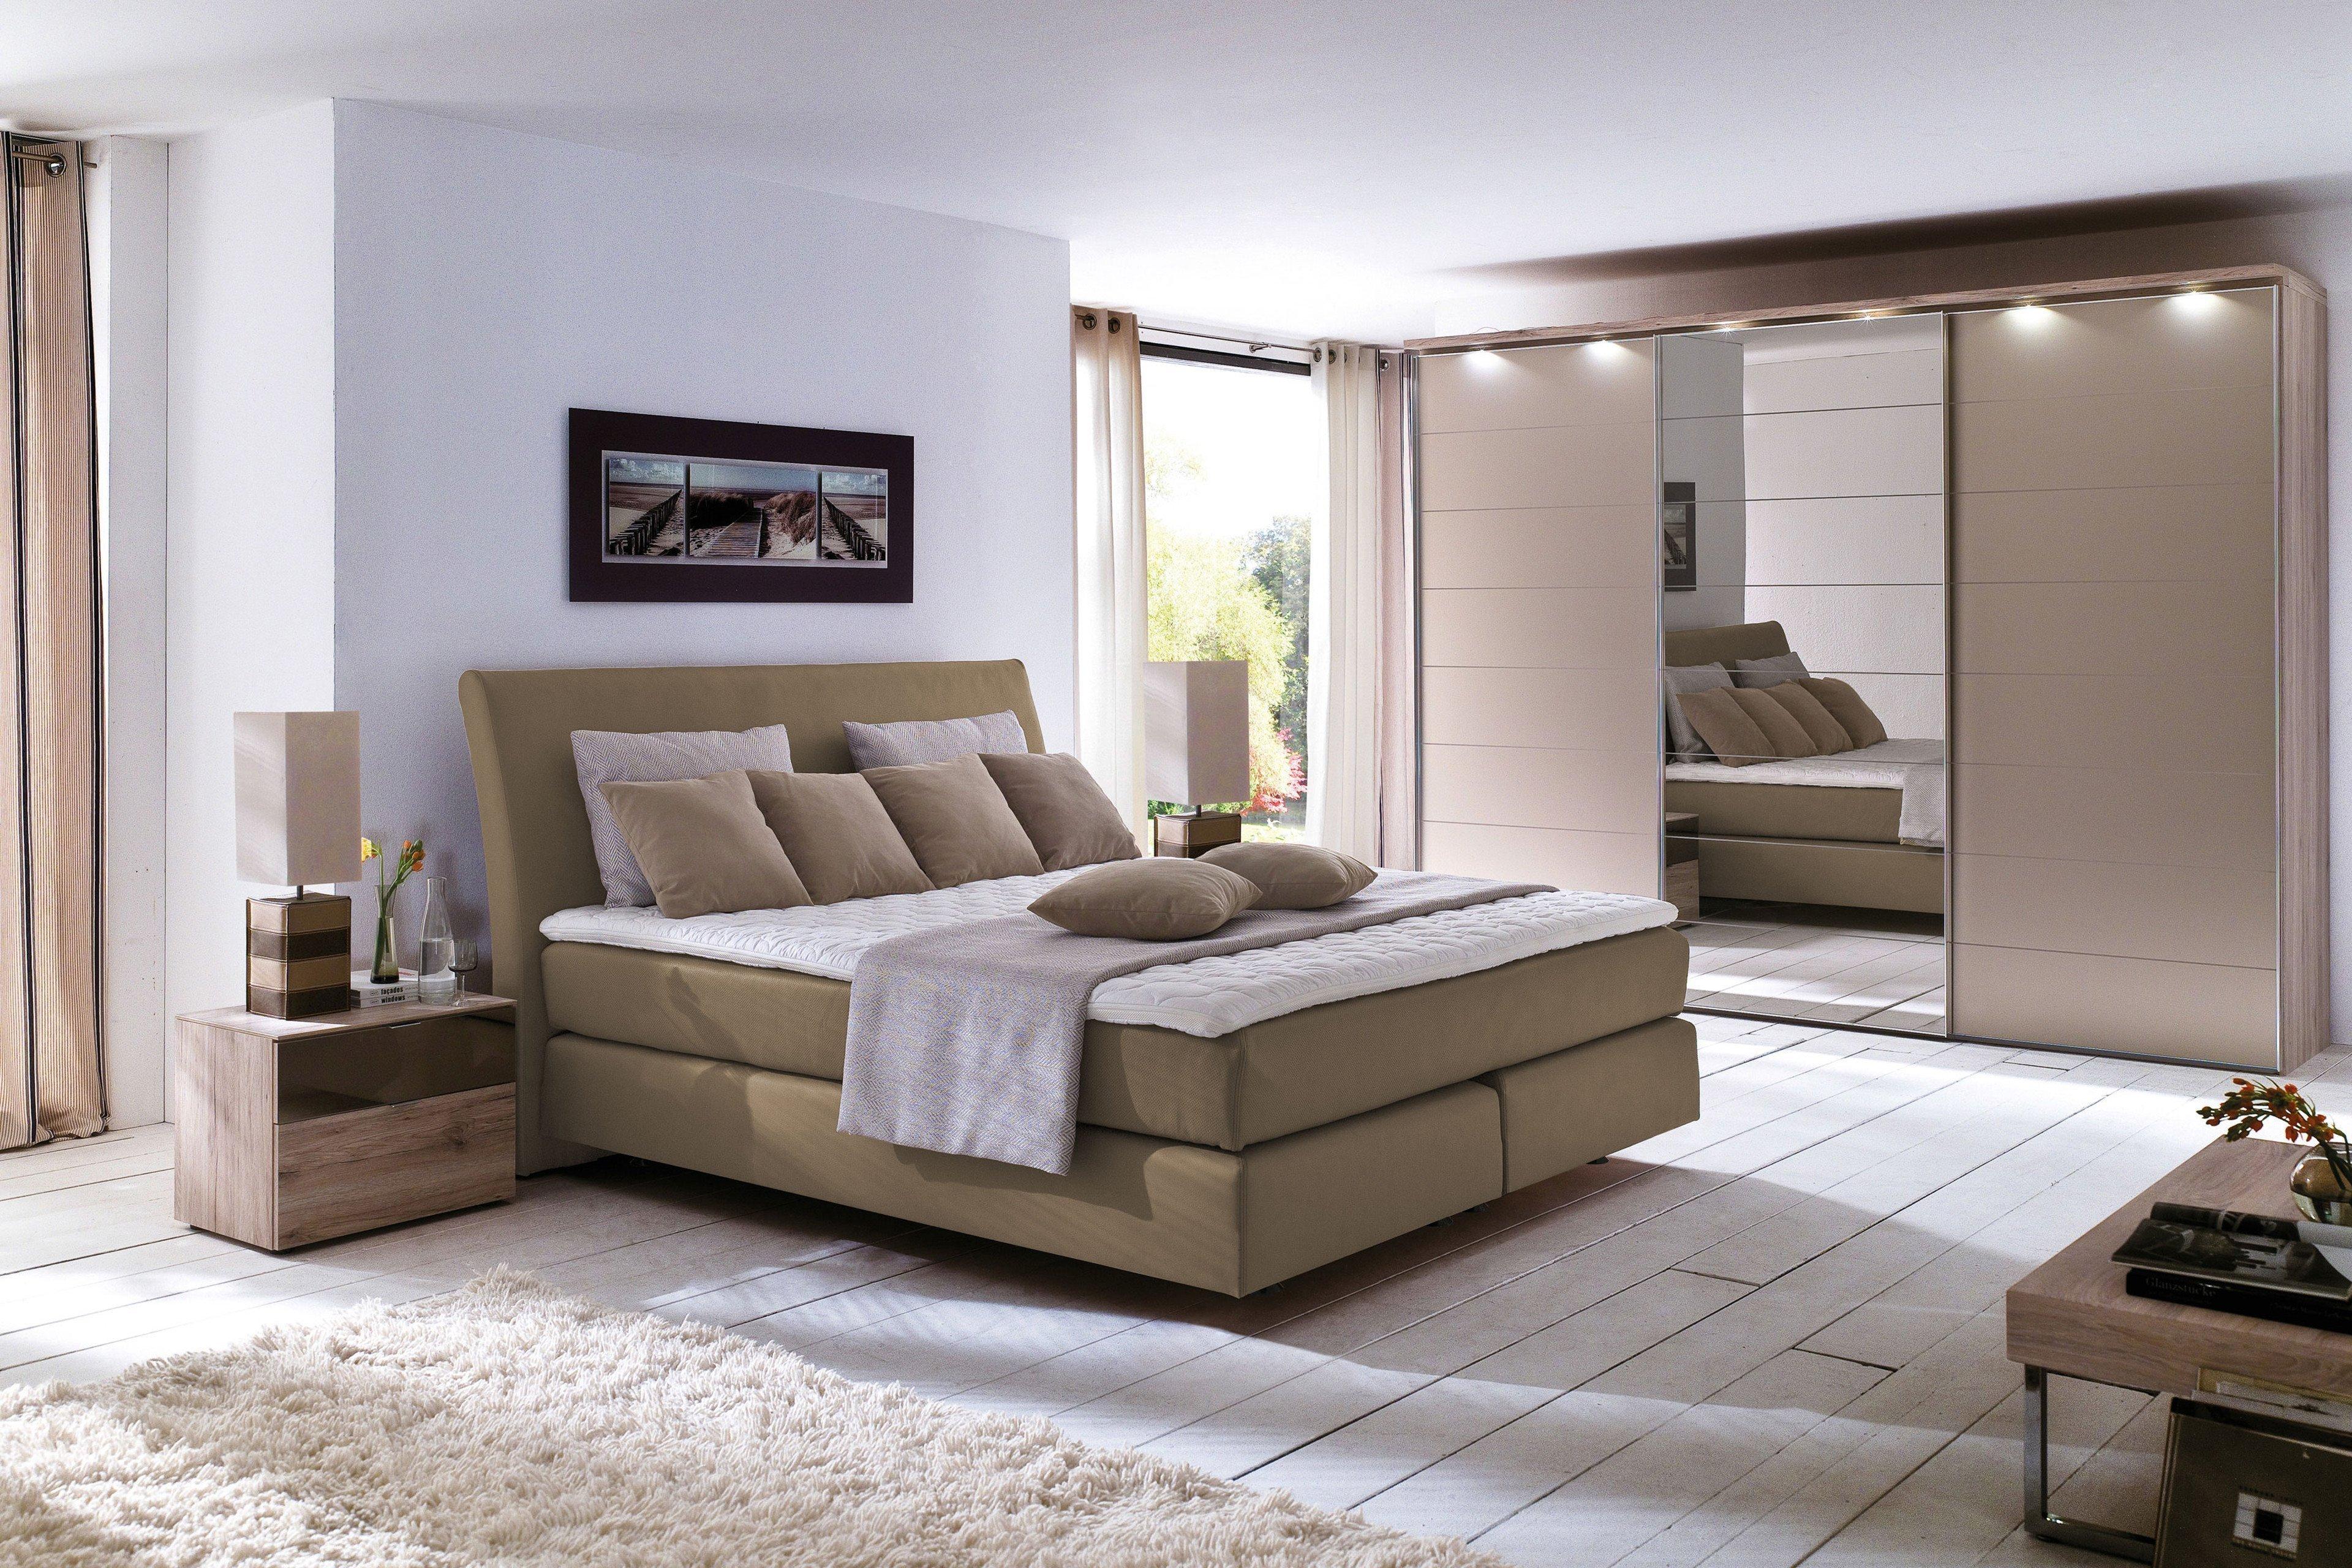 oschmann belcanto royal boxspringbett in einem zarten. Black Bedroom Furniture Sets. Home Design Ideas